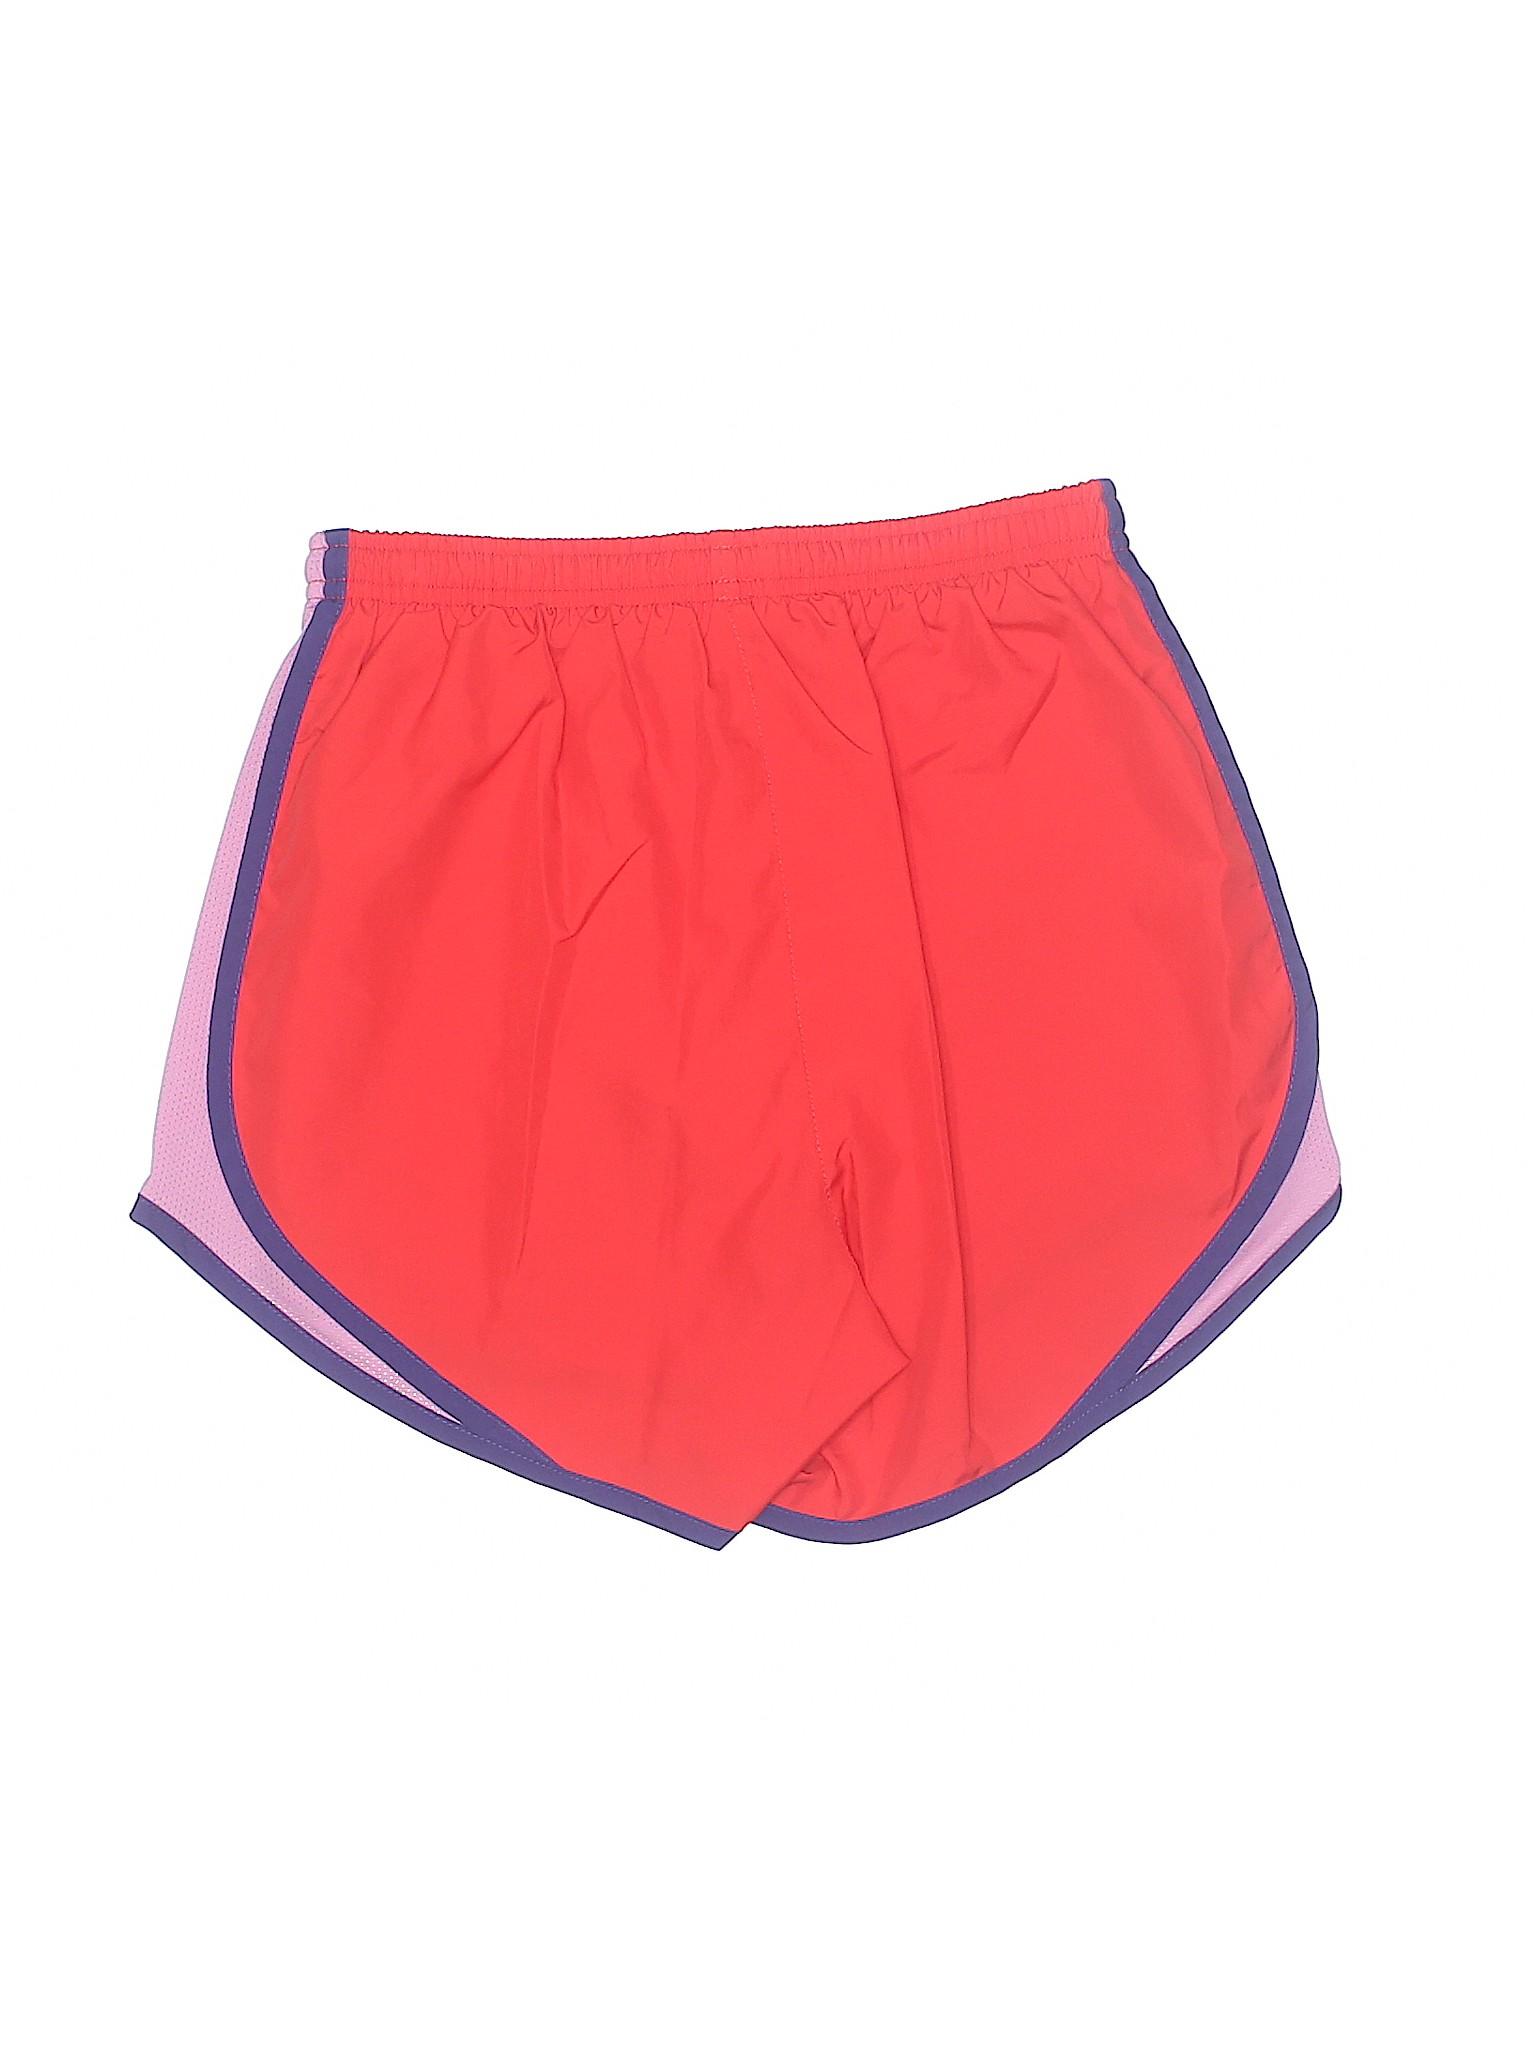 Athletic Boutique Shorts Nike Boutique Nike Tzx8vq